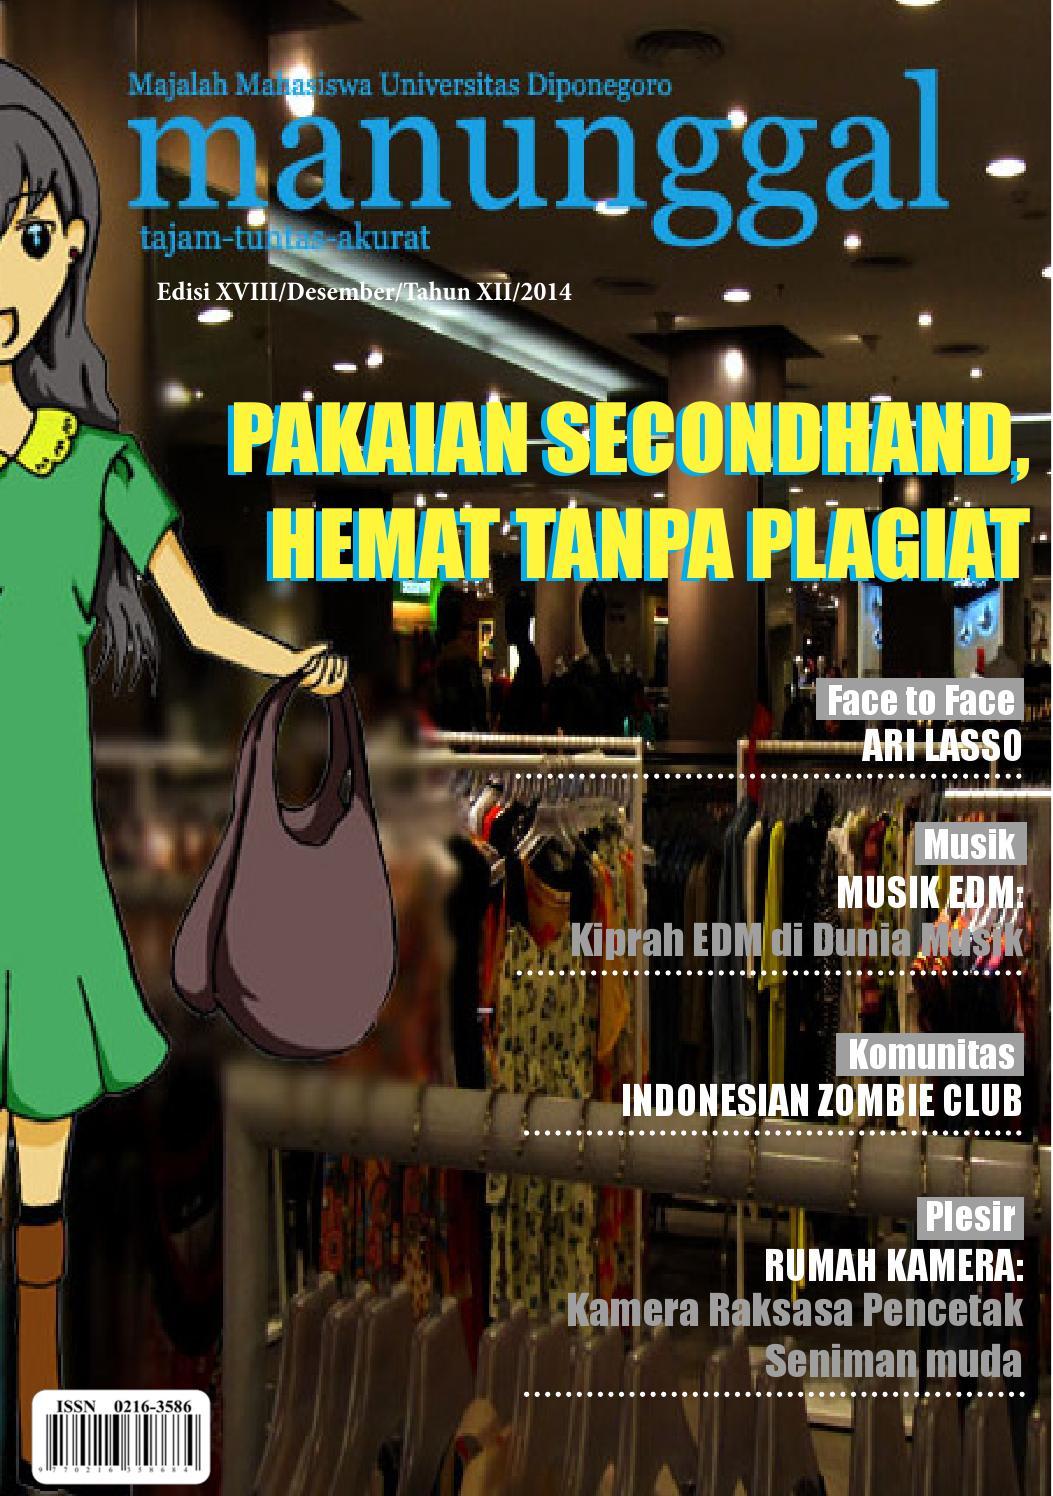 Majalah Edisi XVII Desember Tahun XII 2014 By LPM Manunggal Issuu